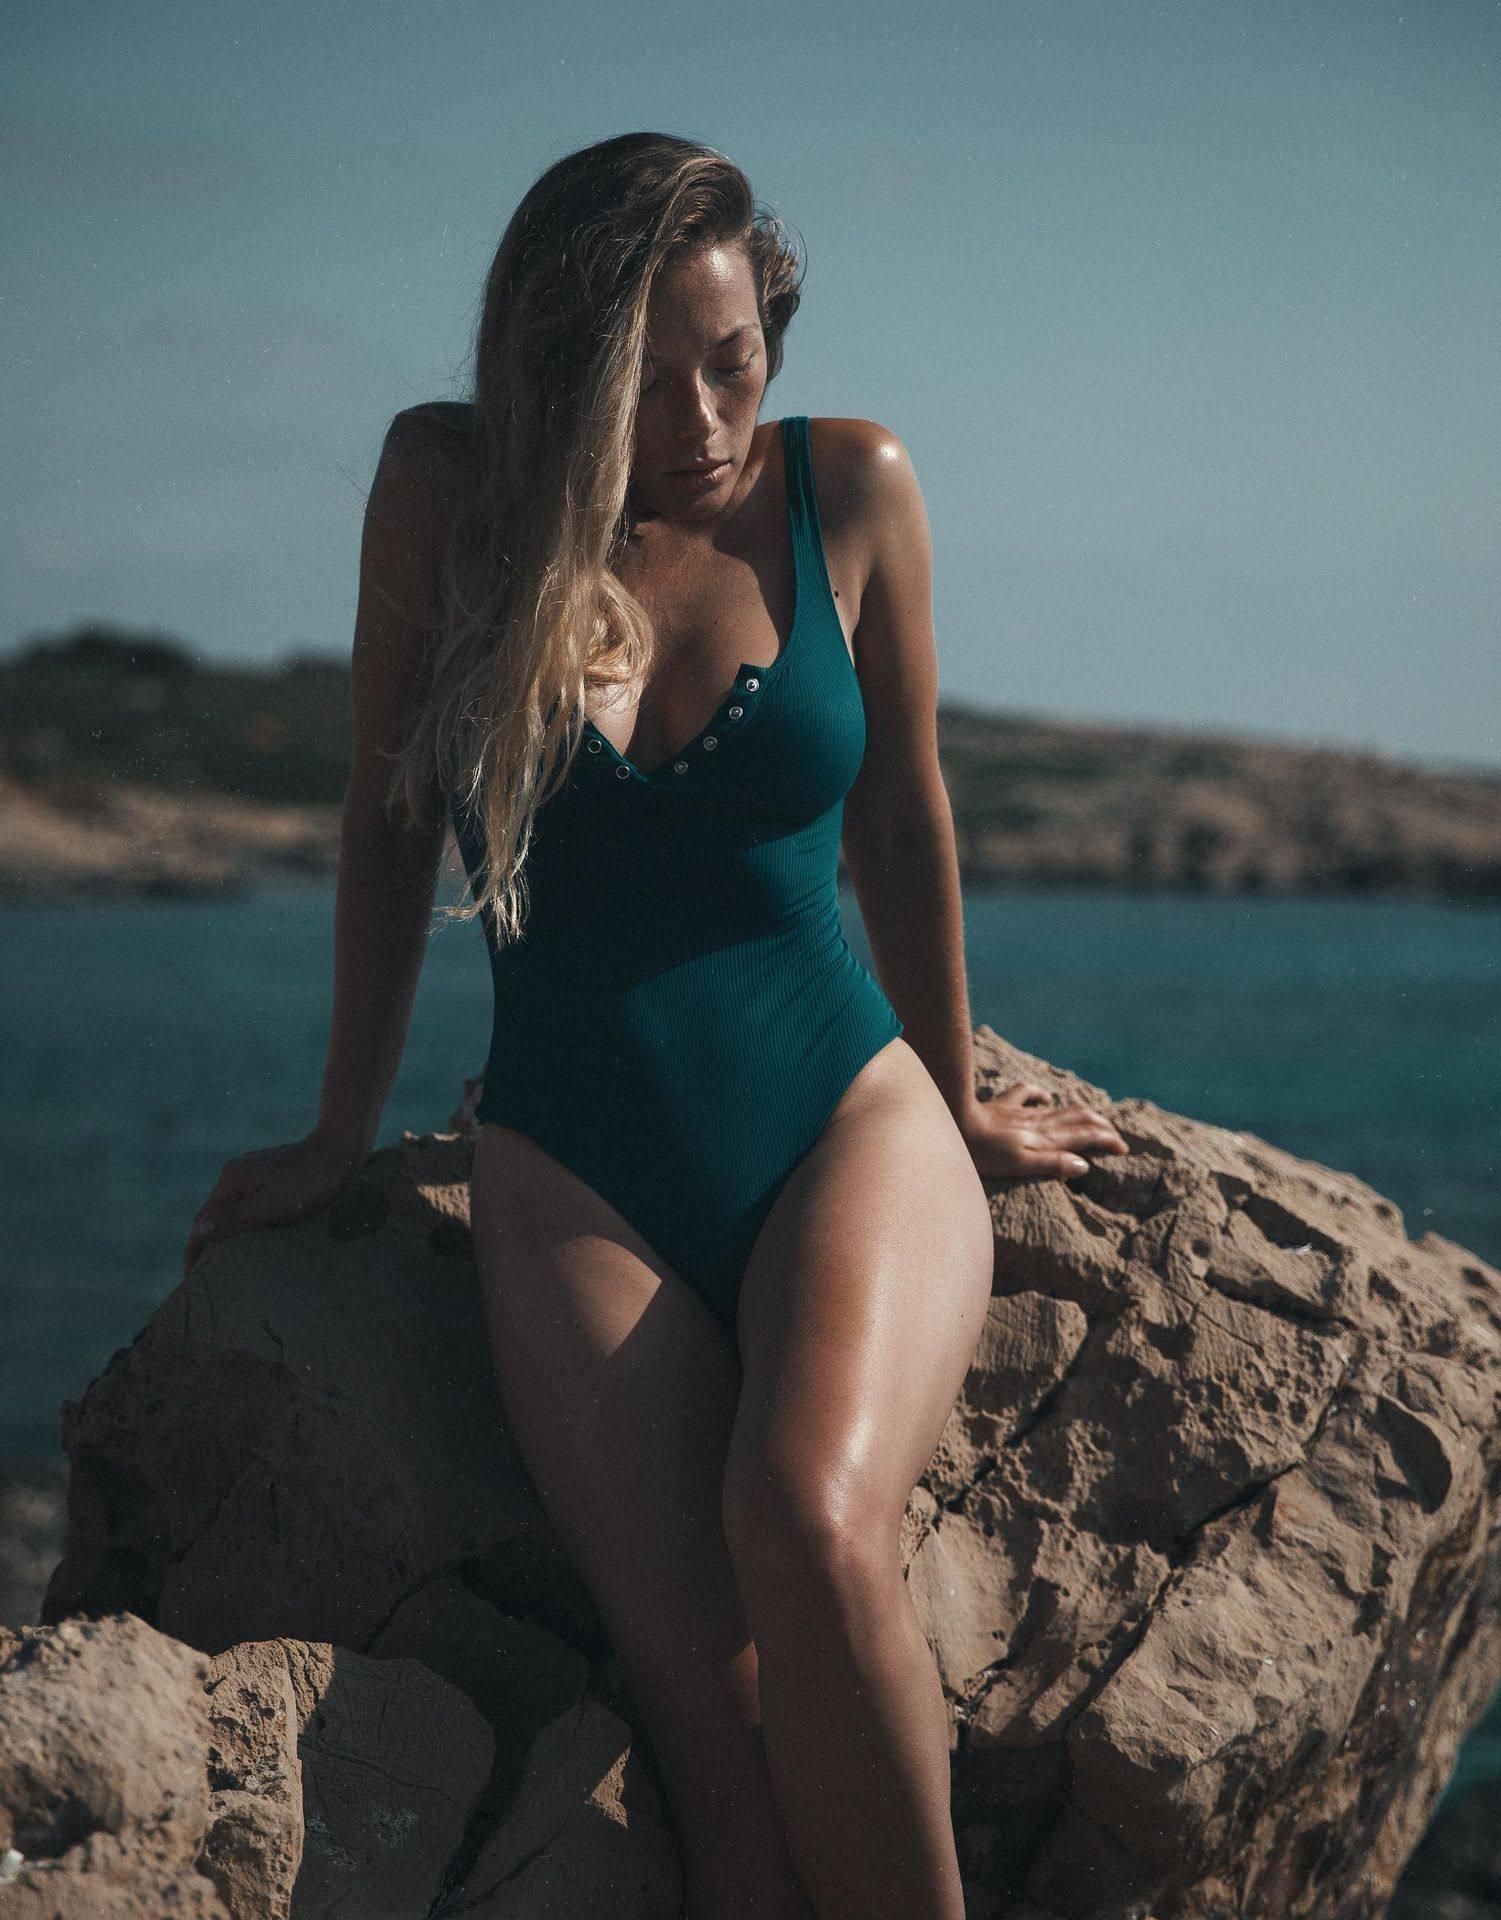 Olga Kobzar – Hot Big Boobs In Sexy Full Frontal Nude Photoshoot By Thomas Agatz (nsfw) 0022